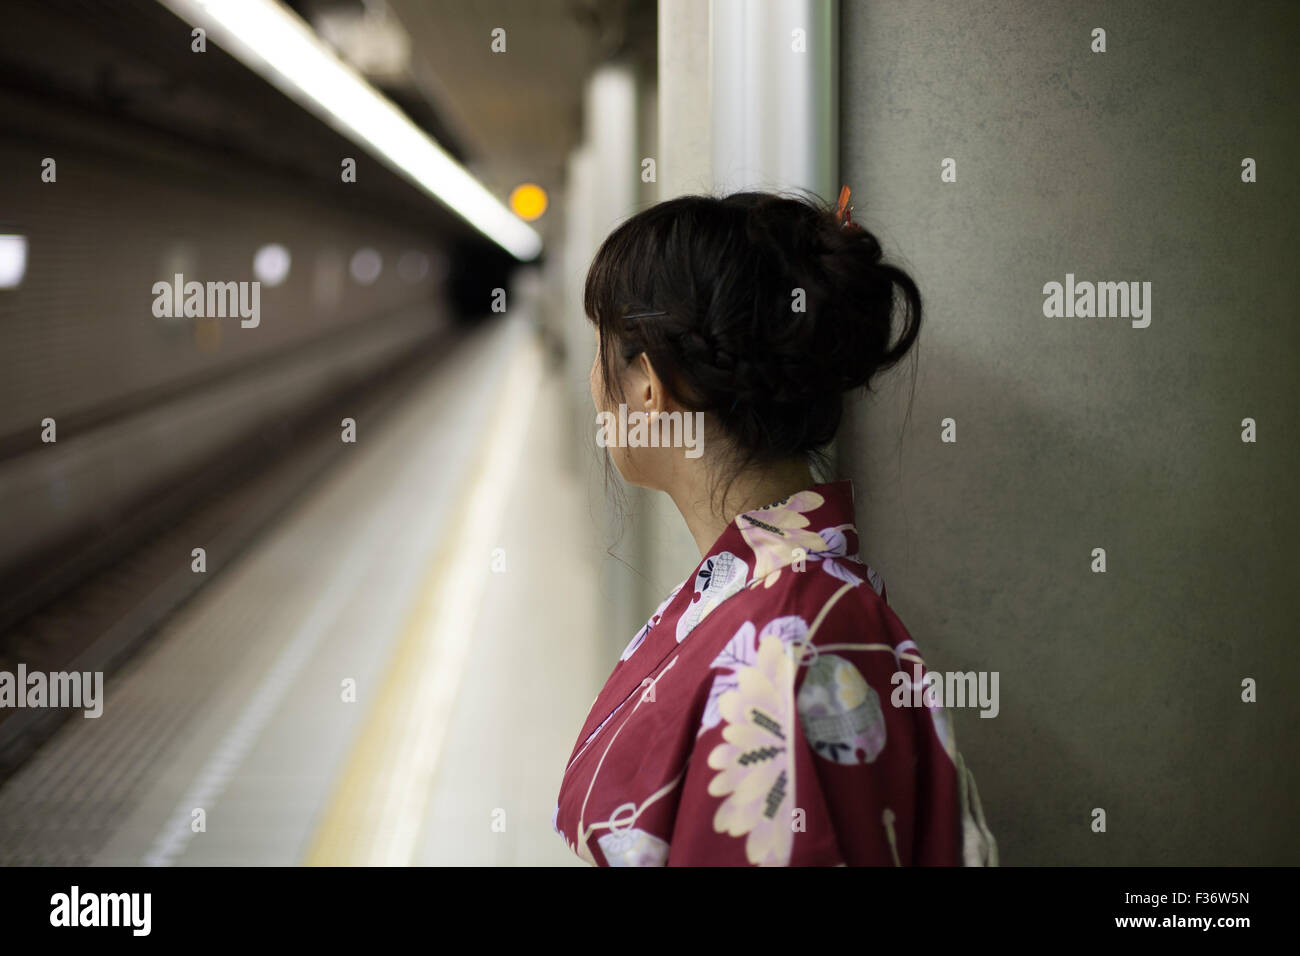 Girl in kimono waiting on subway platform Stock Photo